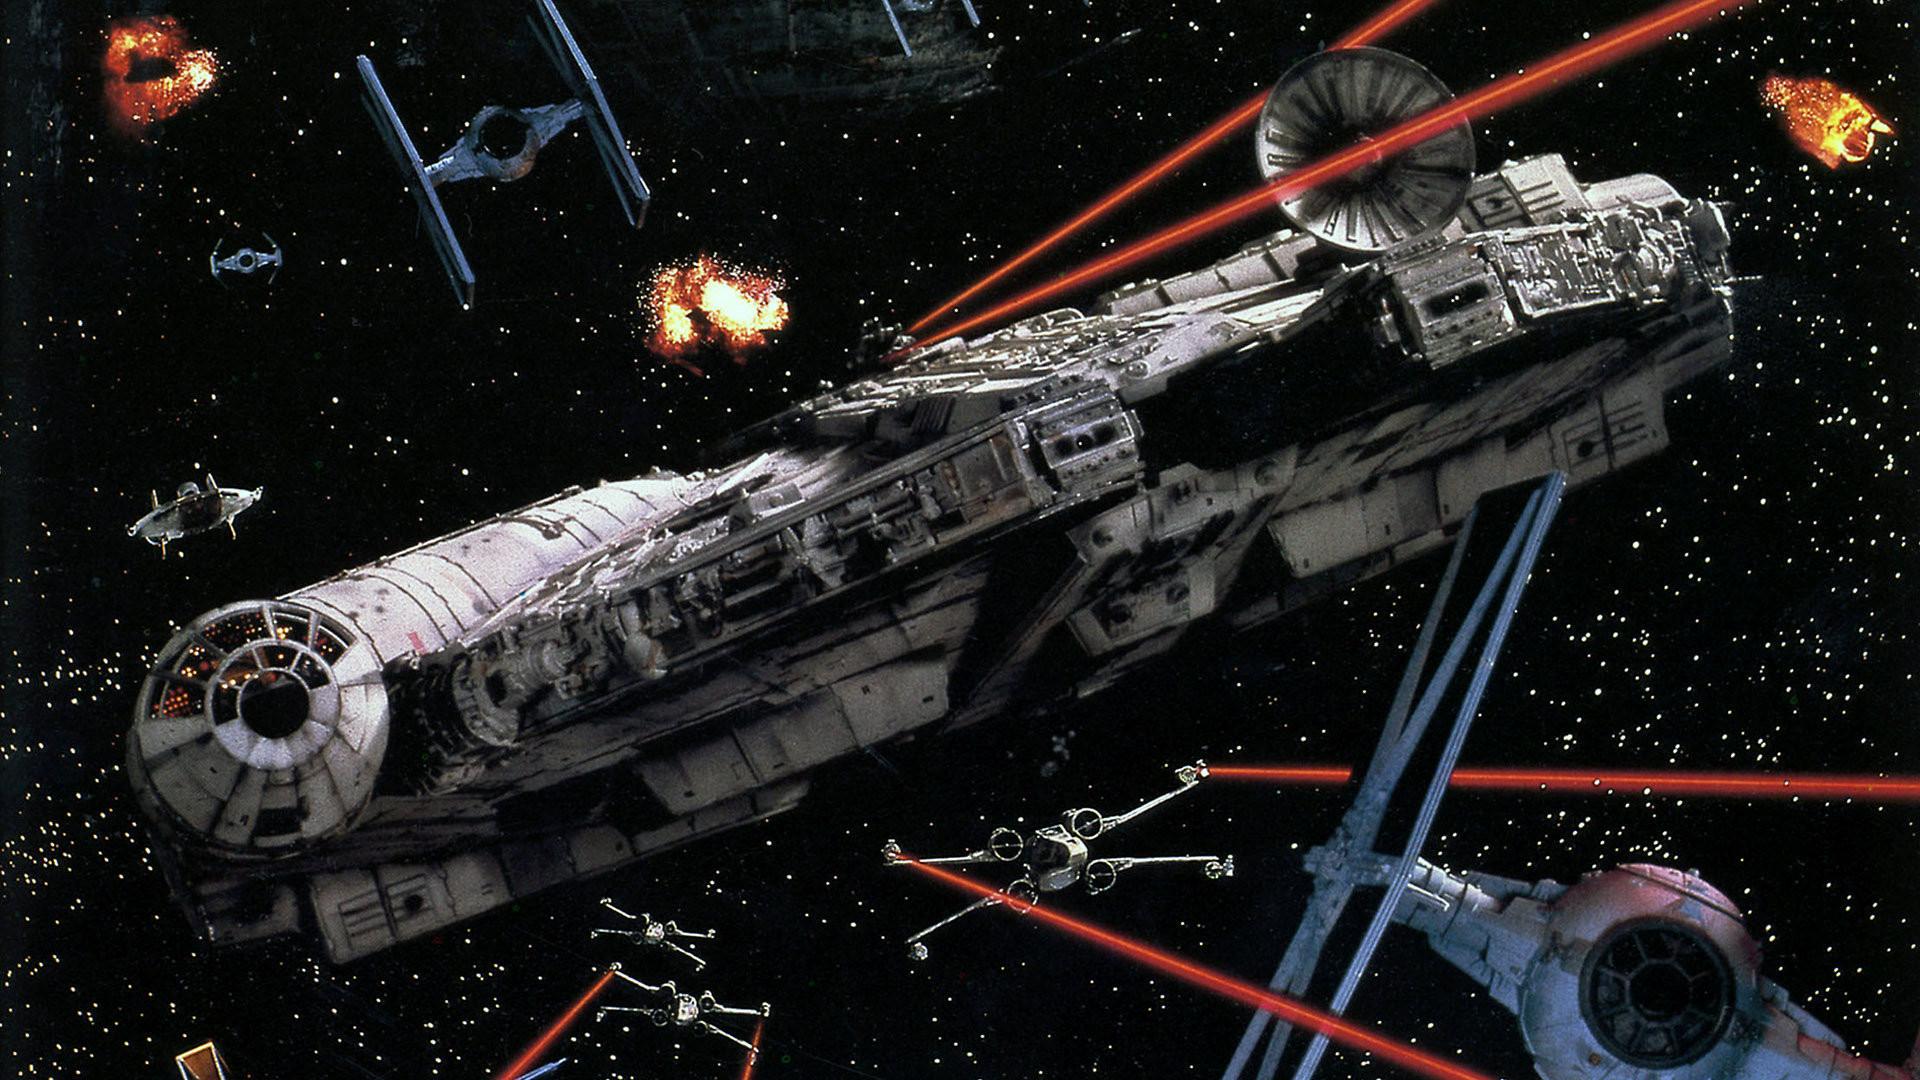 Star Wars Ships Wallpaper Widescreen hd background hd screensavers hd 1920x1080